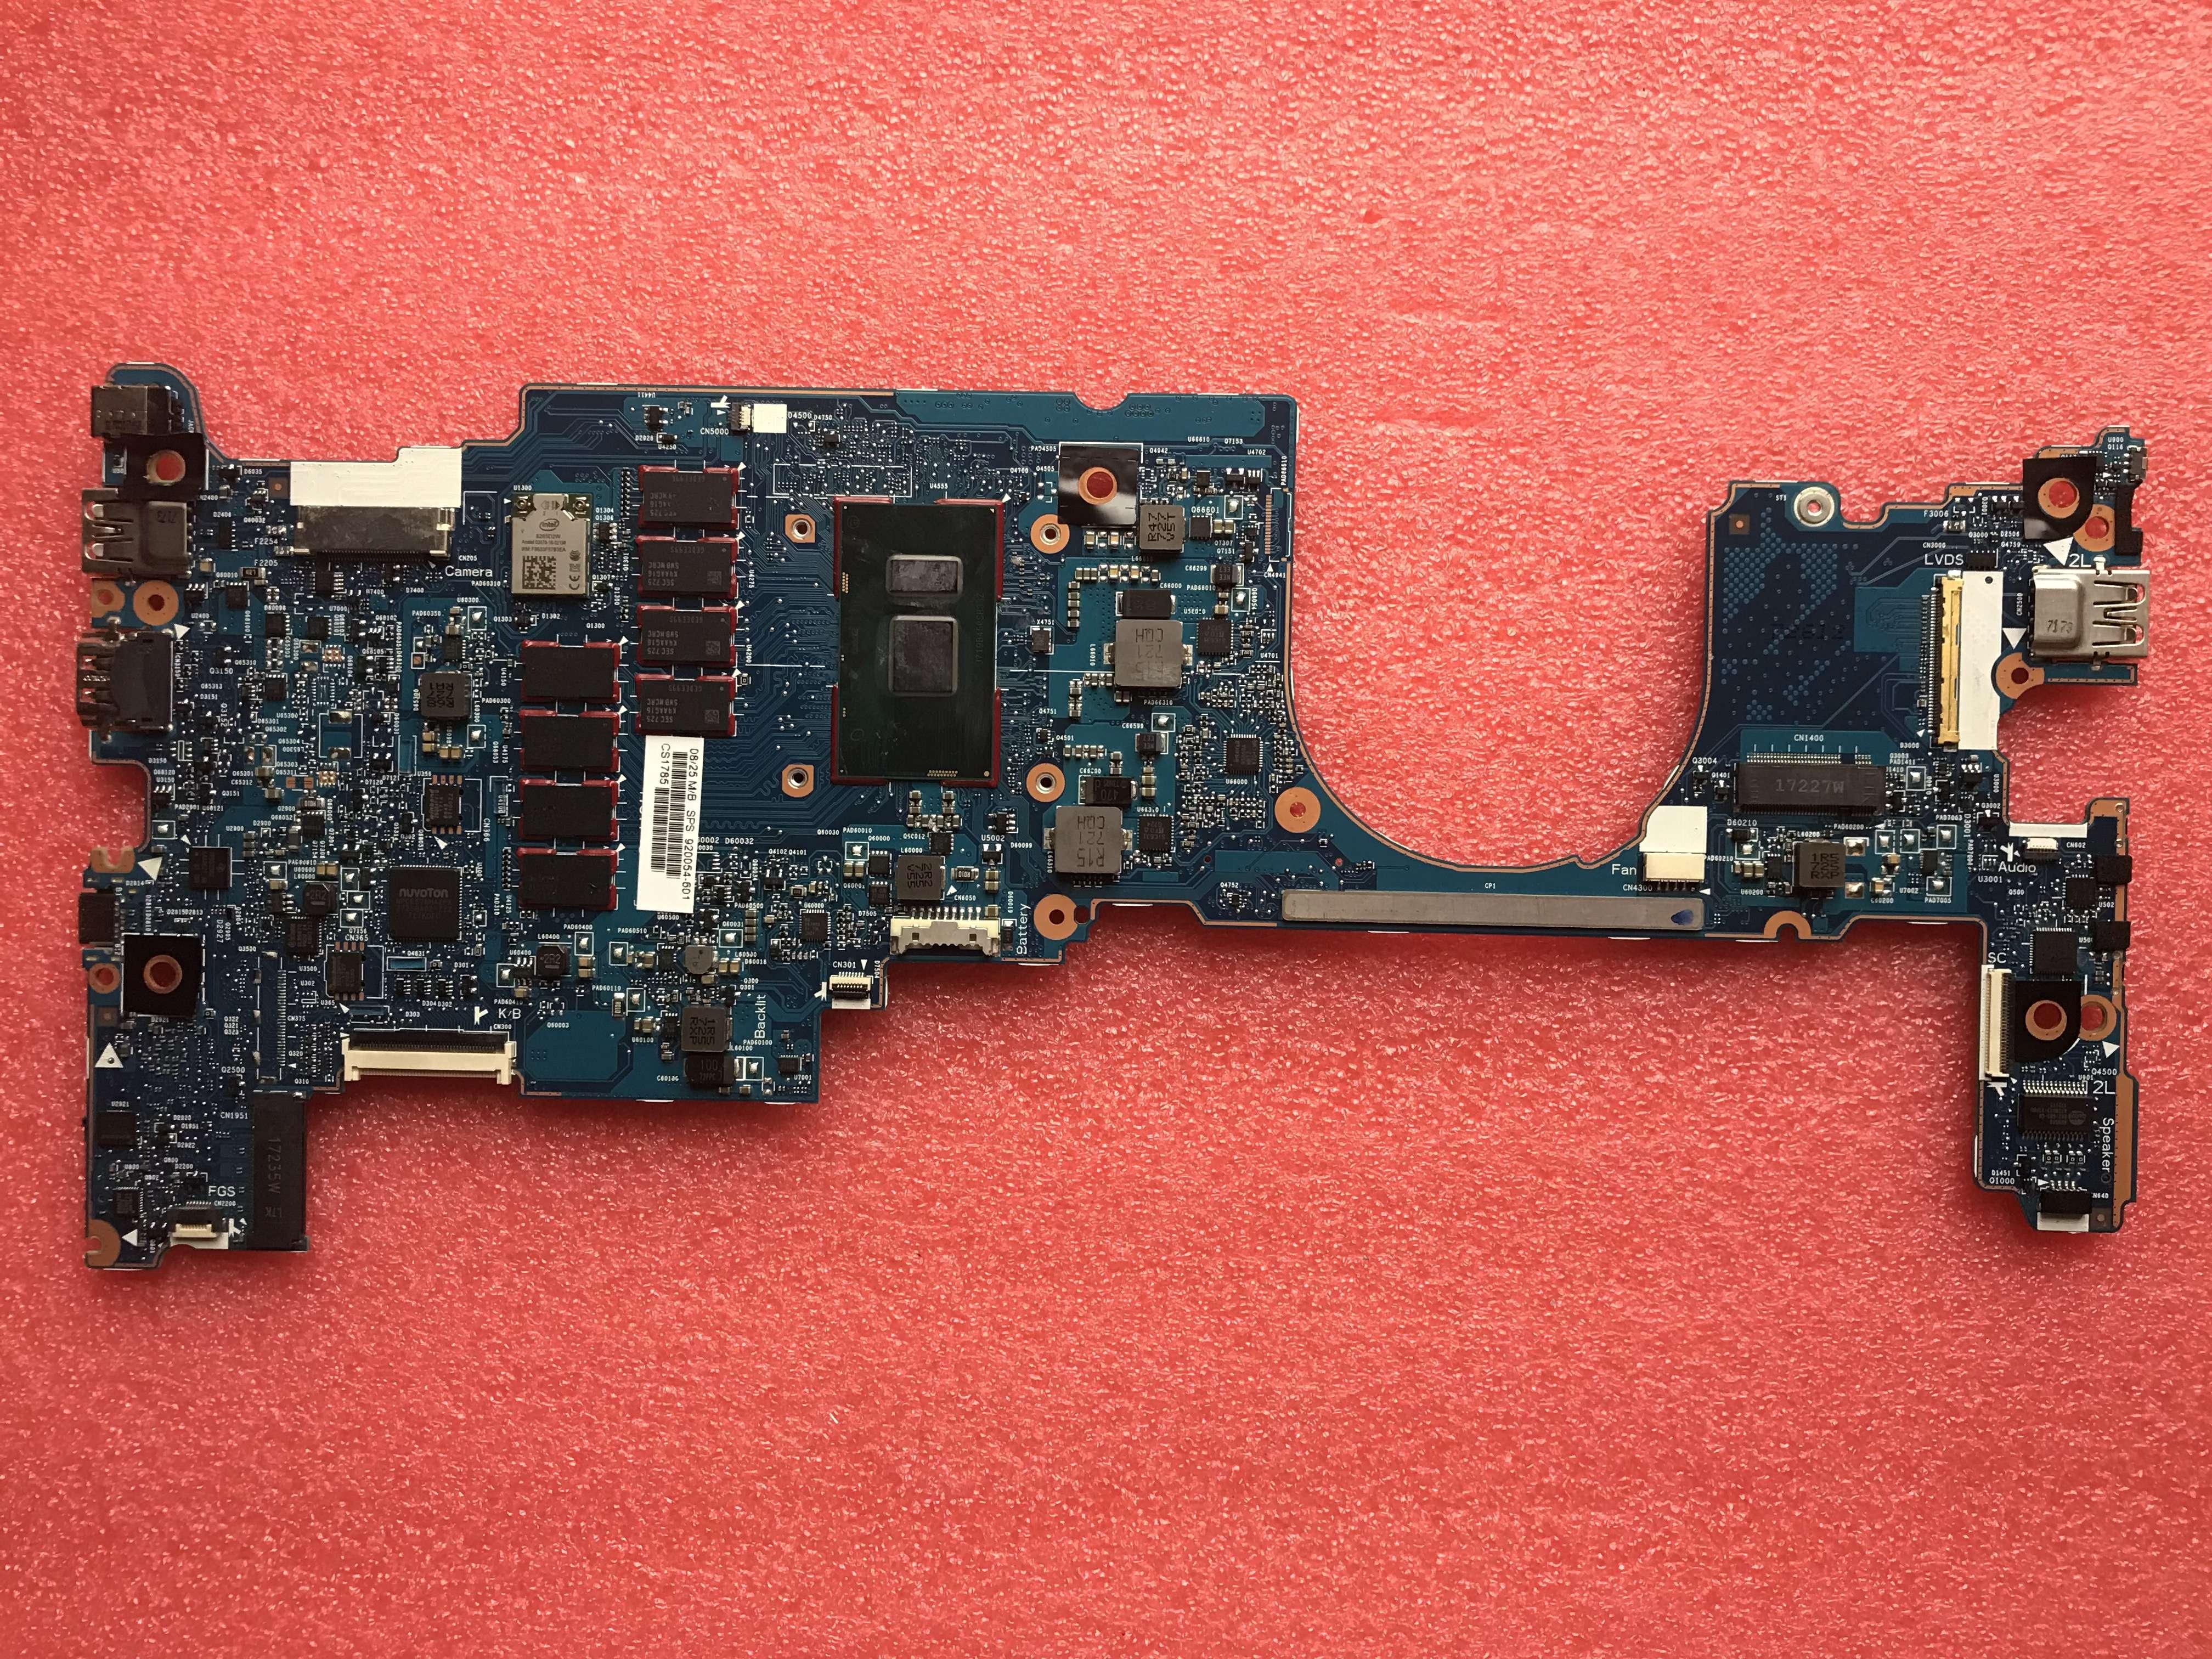 Placa base para ordenador portátil 920054-601 920054-001, para HP EliteBook X360 1030 G2, 6050A2848001-MB-A01, memoria de 16gb SR341 I7-7500U